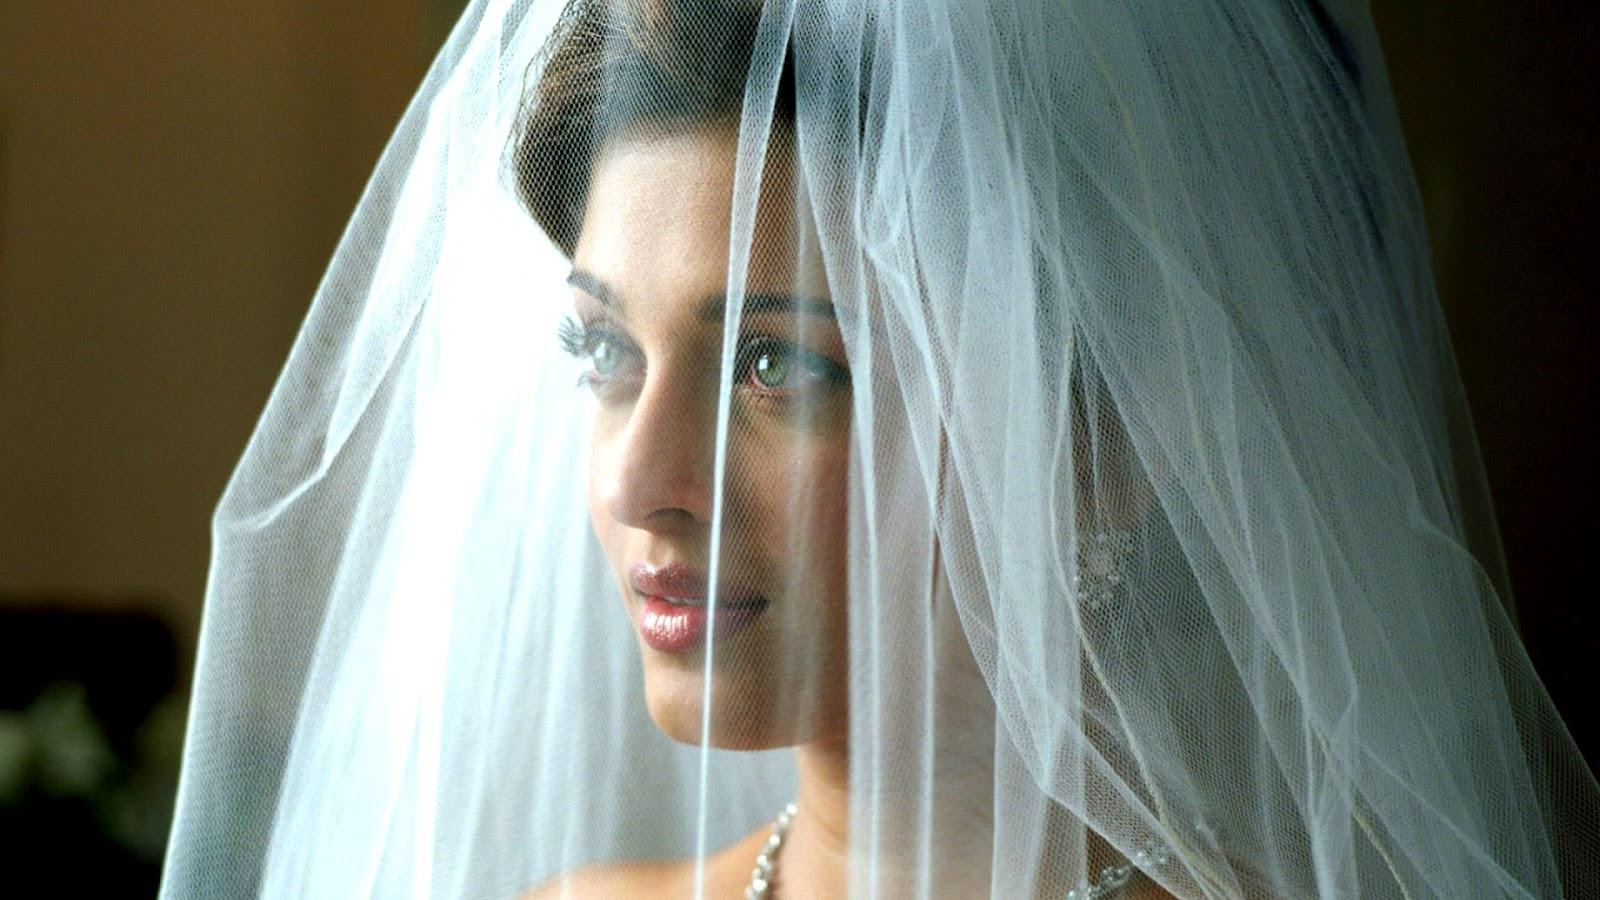 Aishwarya-Rai Looking So Beutifull Wallpapers - Hoteswallpaper-3307